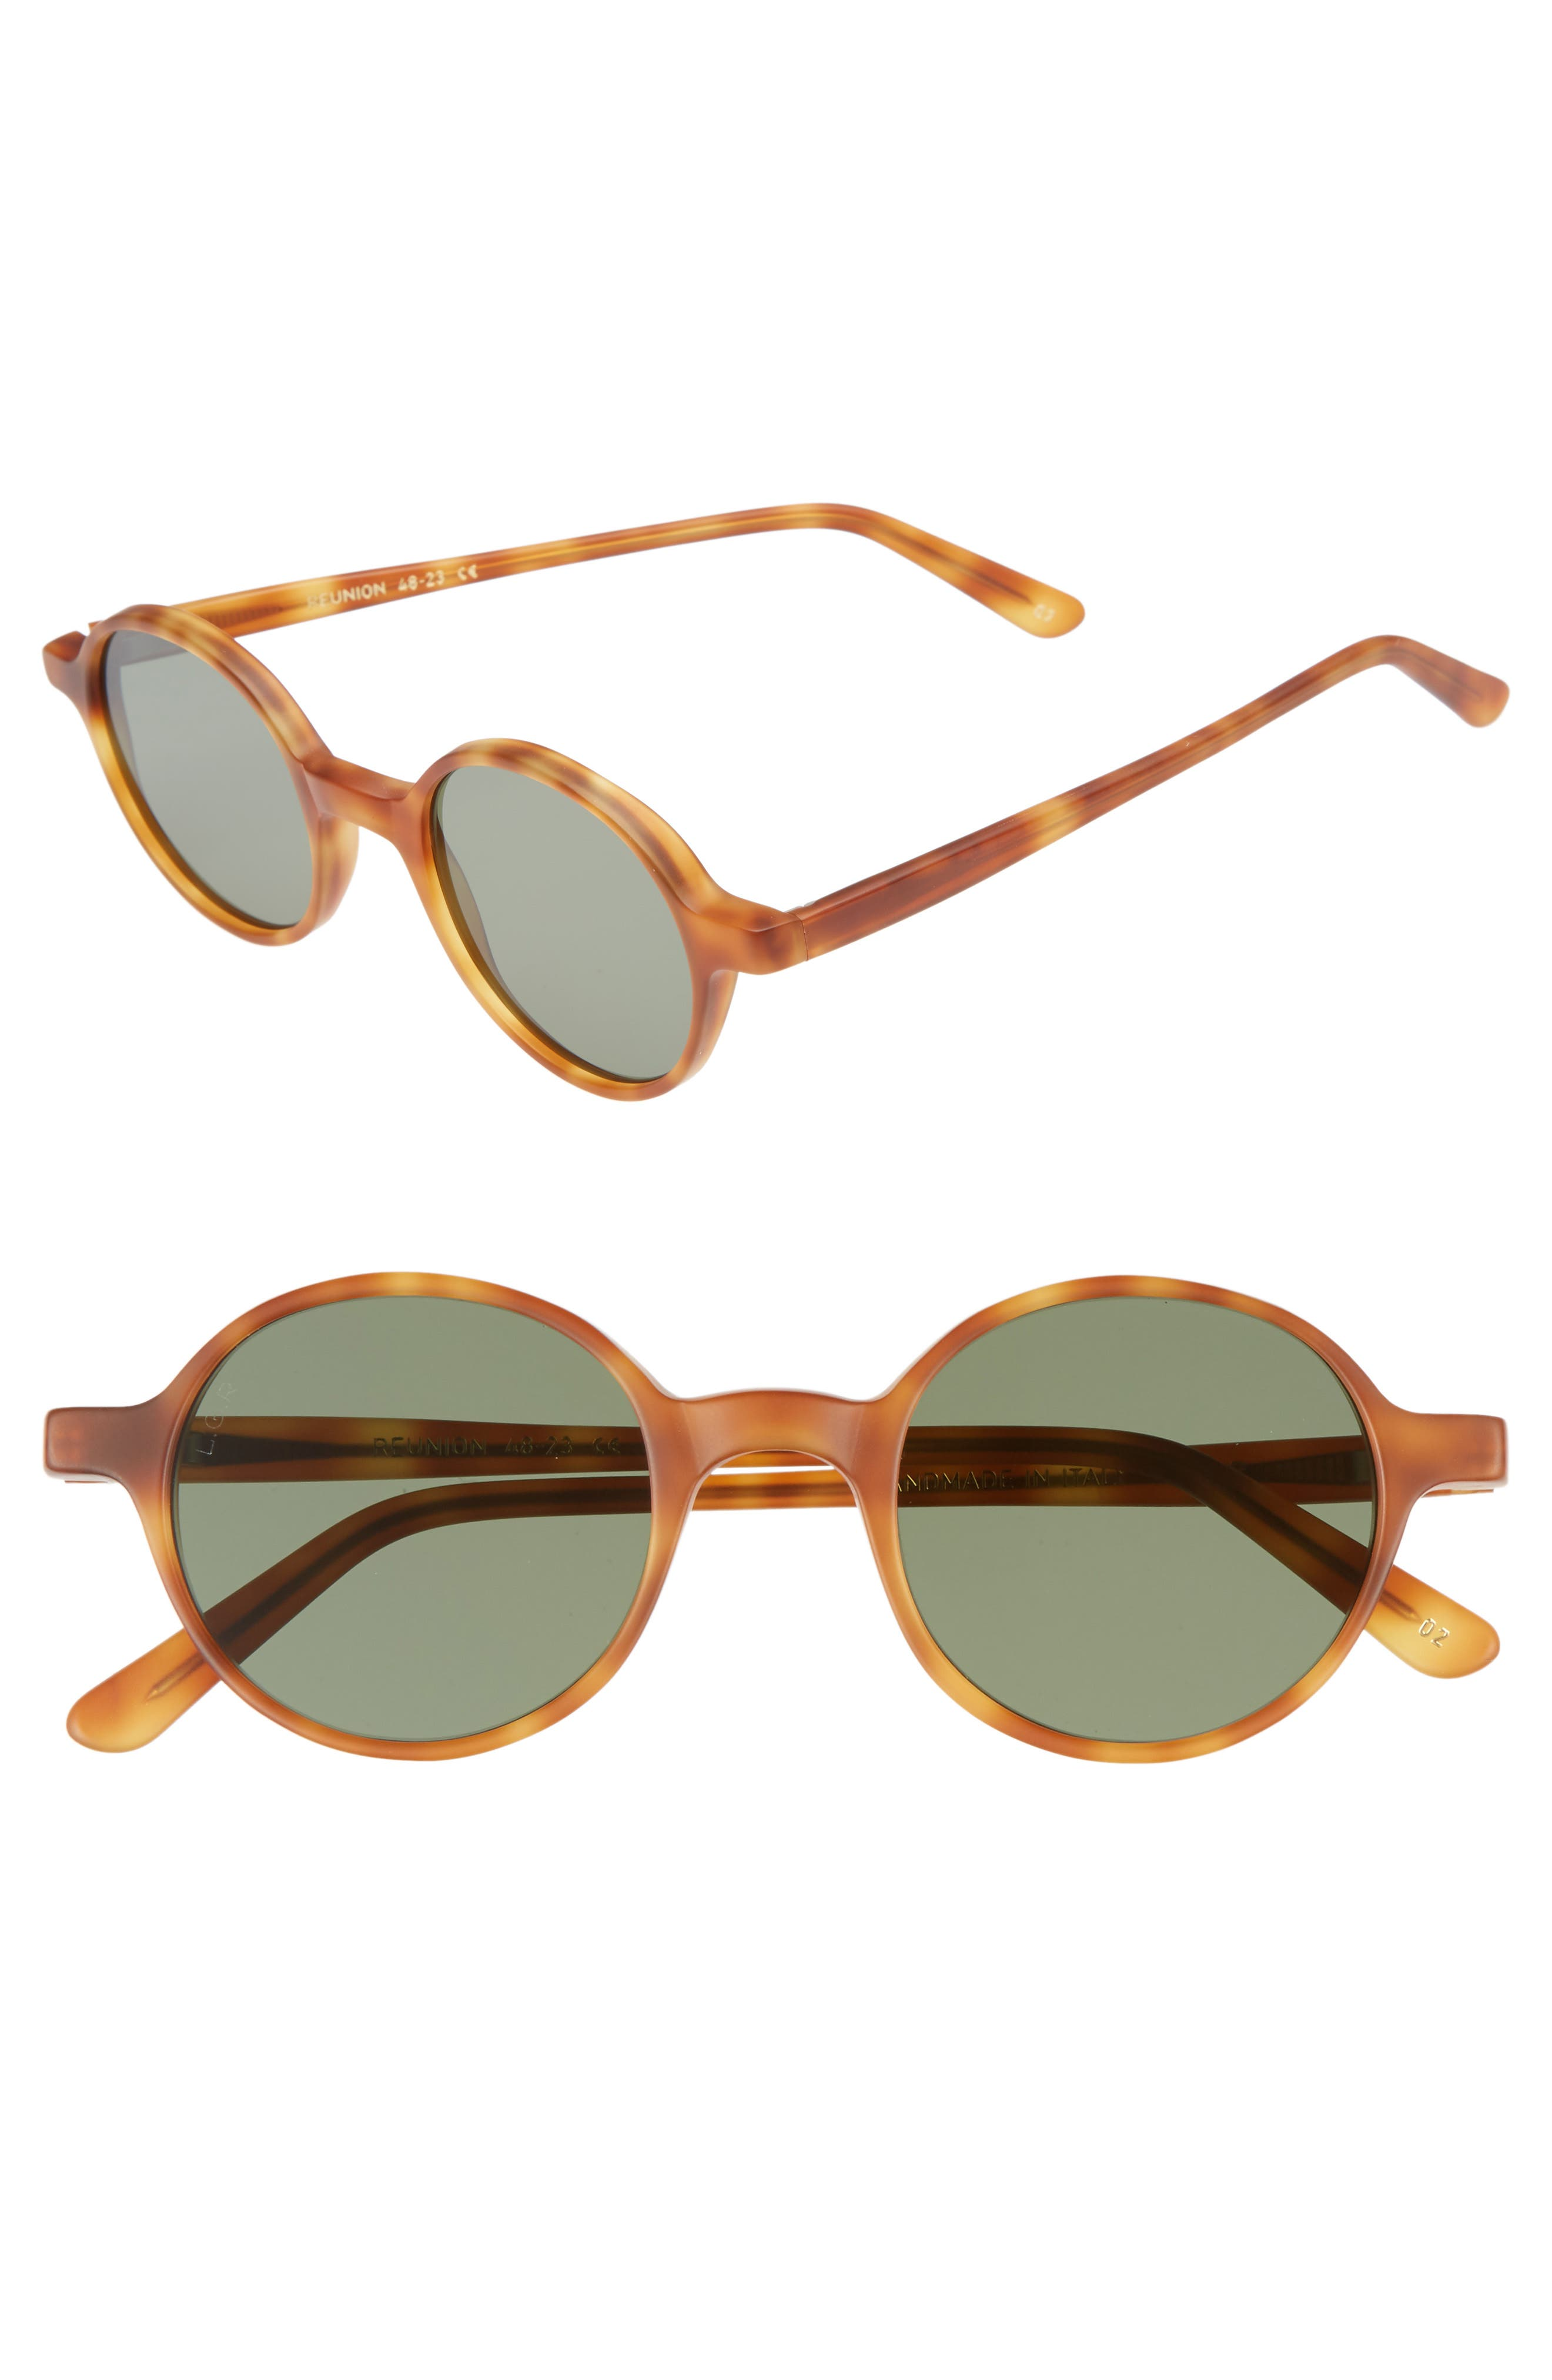 Reunion 48mm Sunglasses,                             Main thumbnail 1, color,                             HAVANA CHIARO